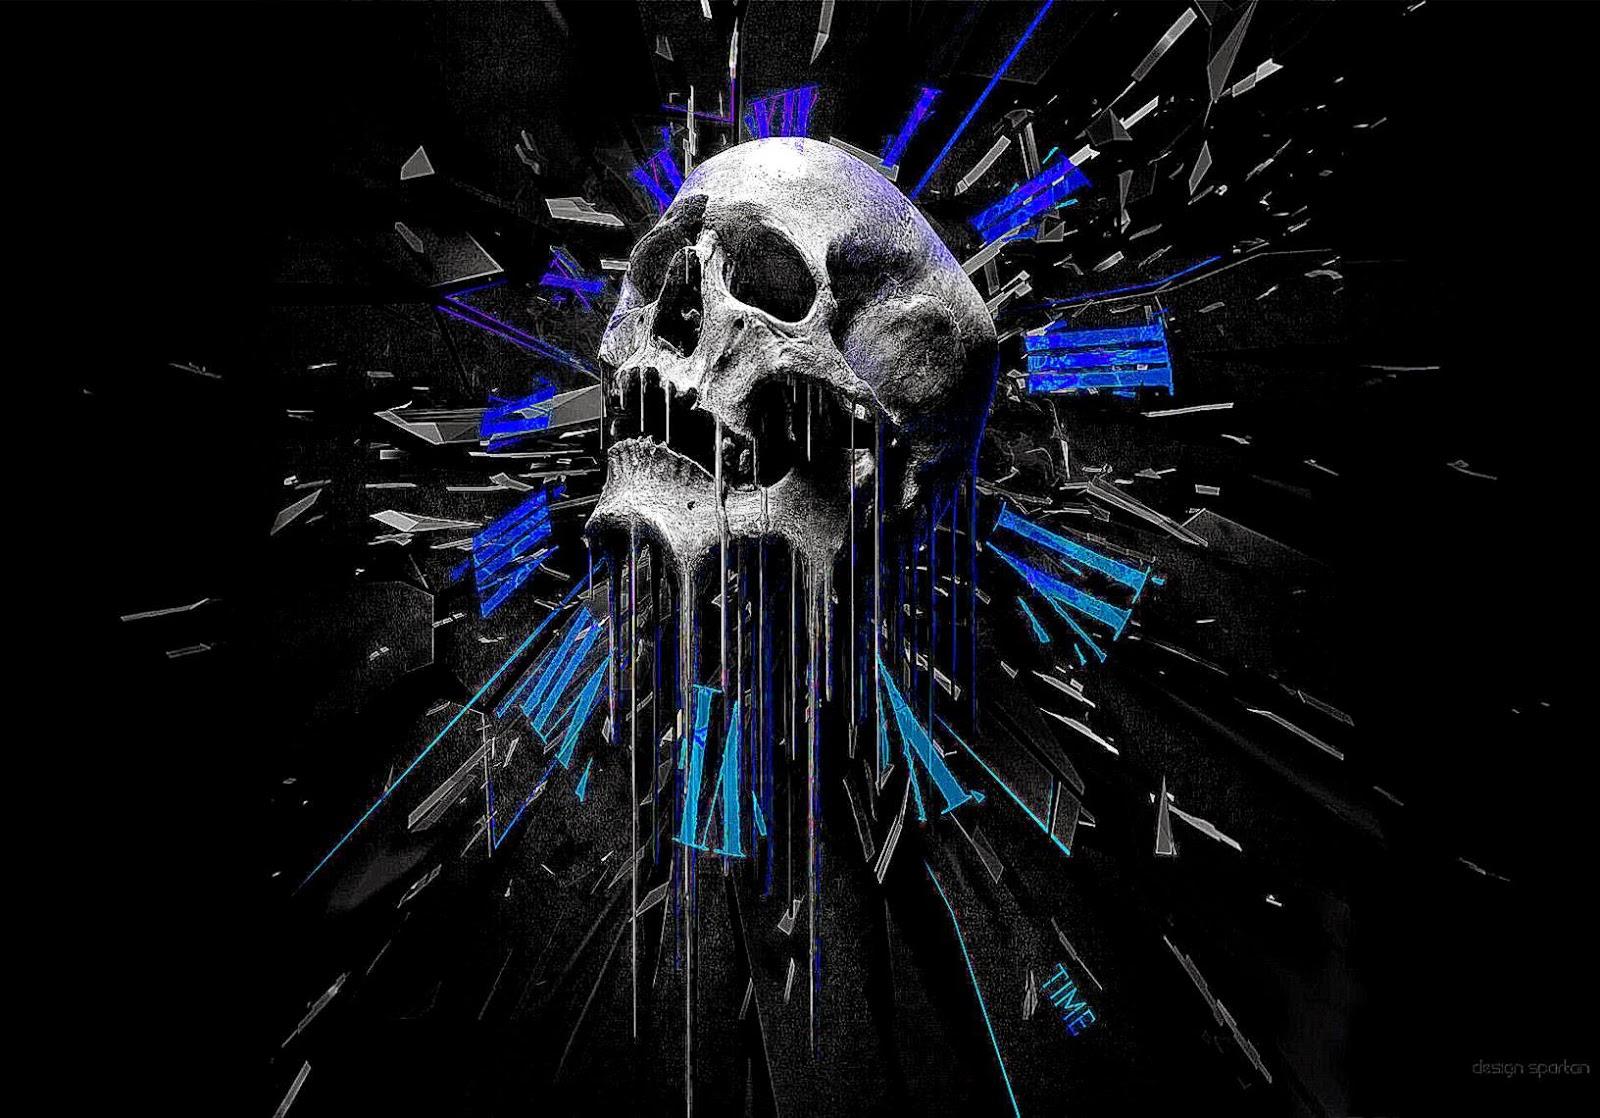 Cool HD Wallpapers: Hd Skull Wallpaper